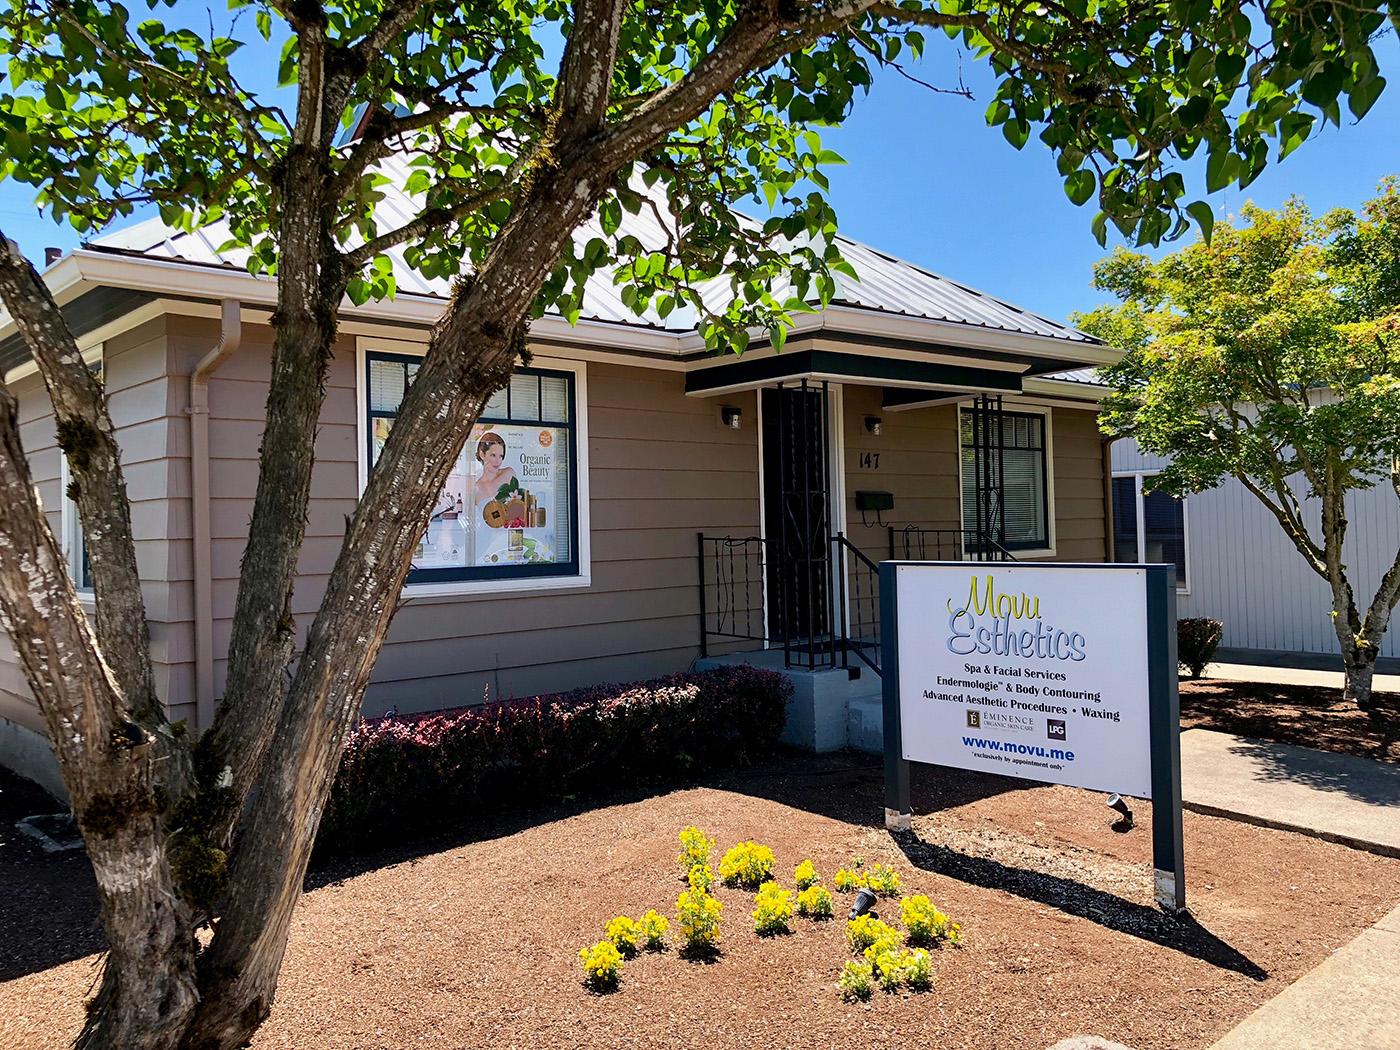 MovuEsthetics   Salon & Spa Esthetician Services   Canby, Oregon